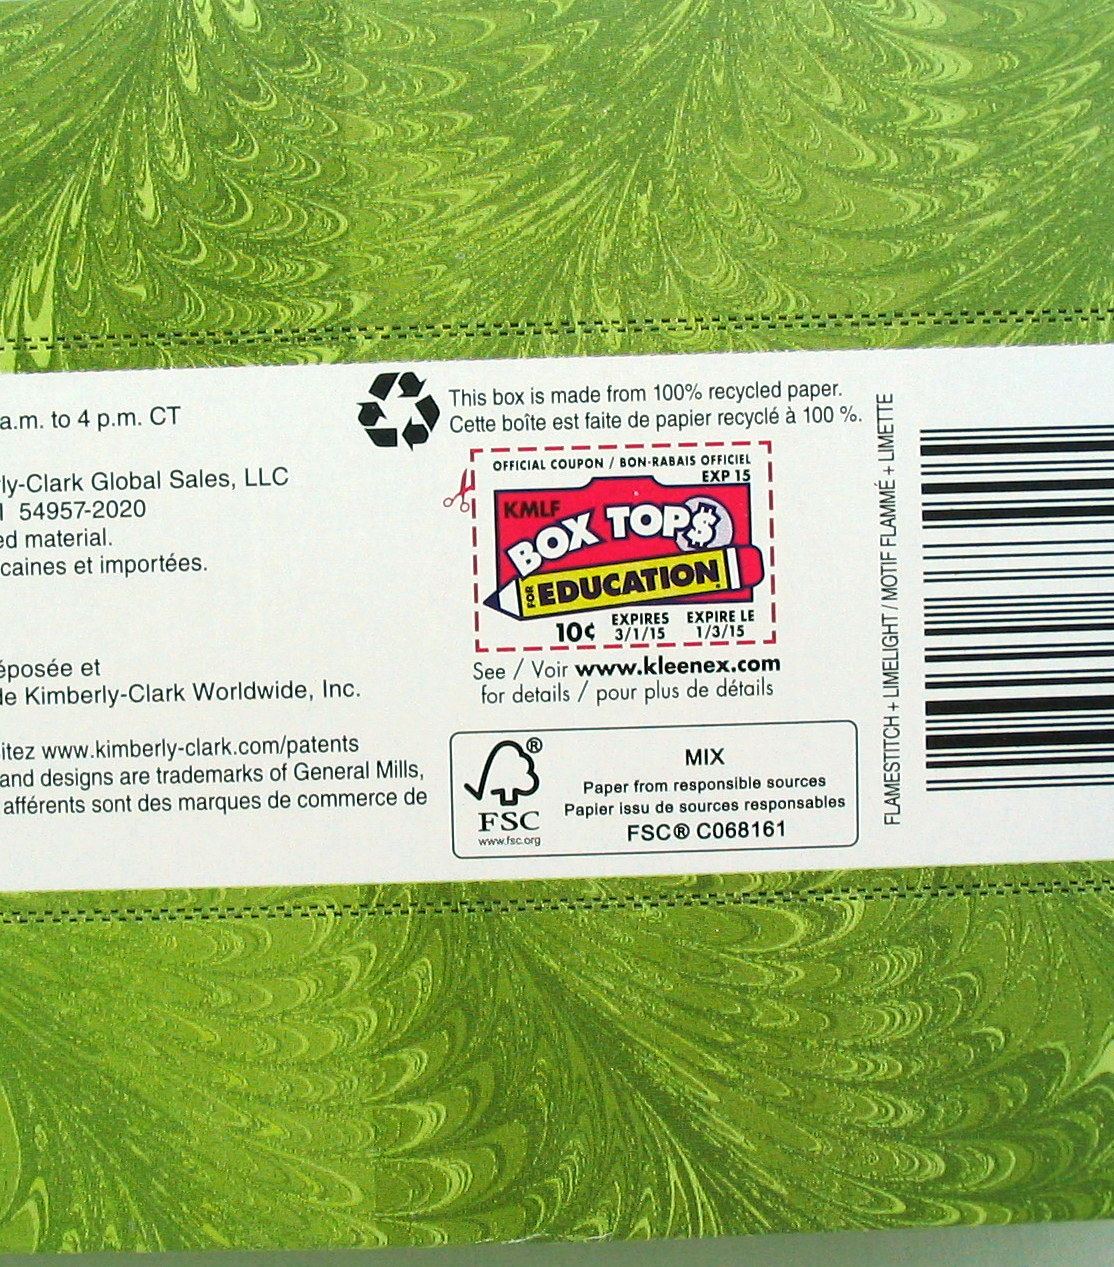 Box tops coupons